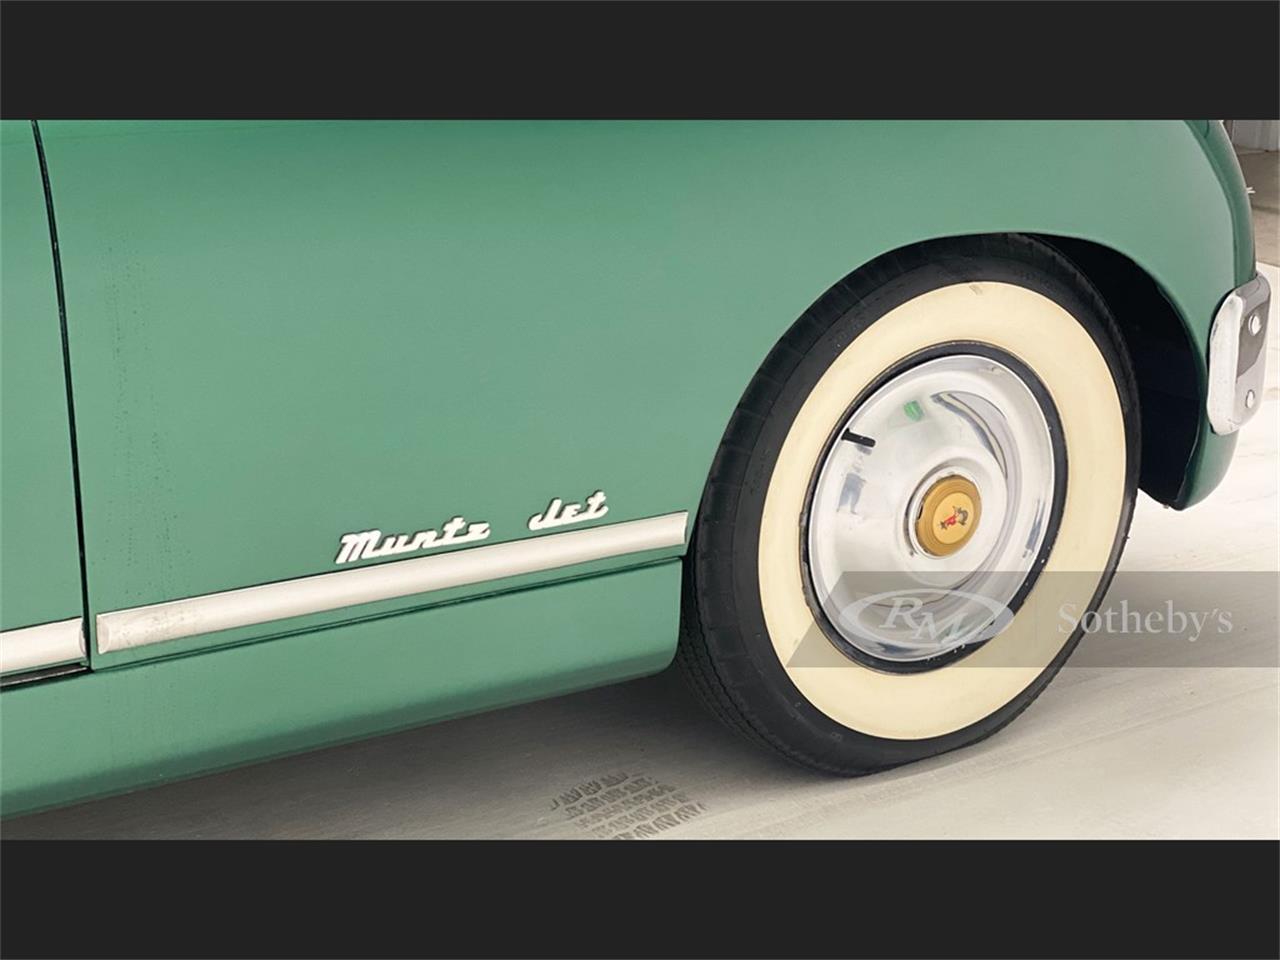 1952 Muntz Jet (CC-1421135) for sale in Hershey, Pennsylvania